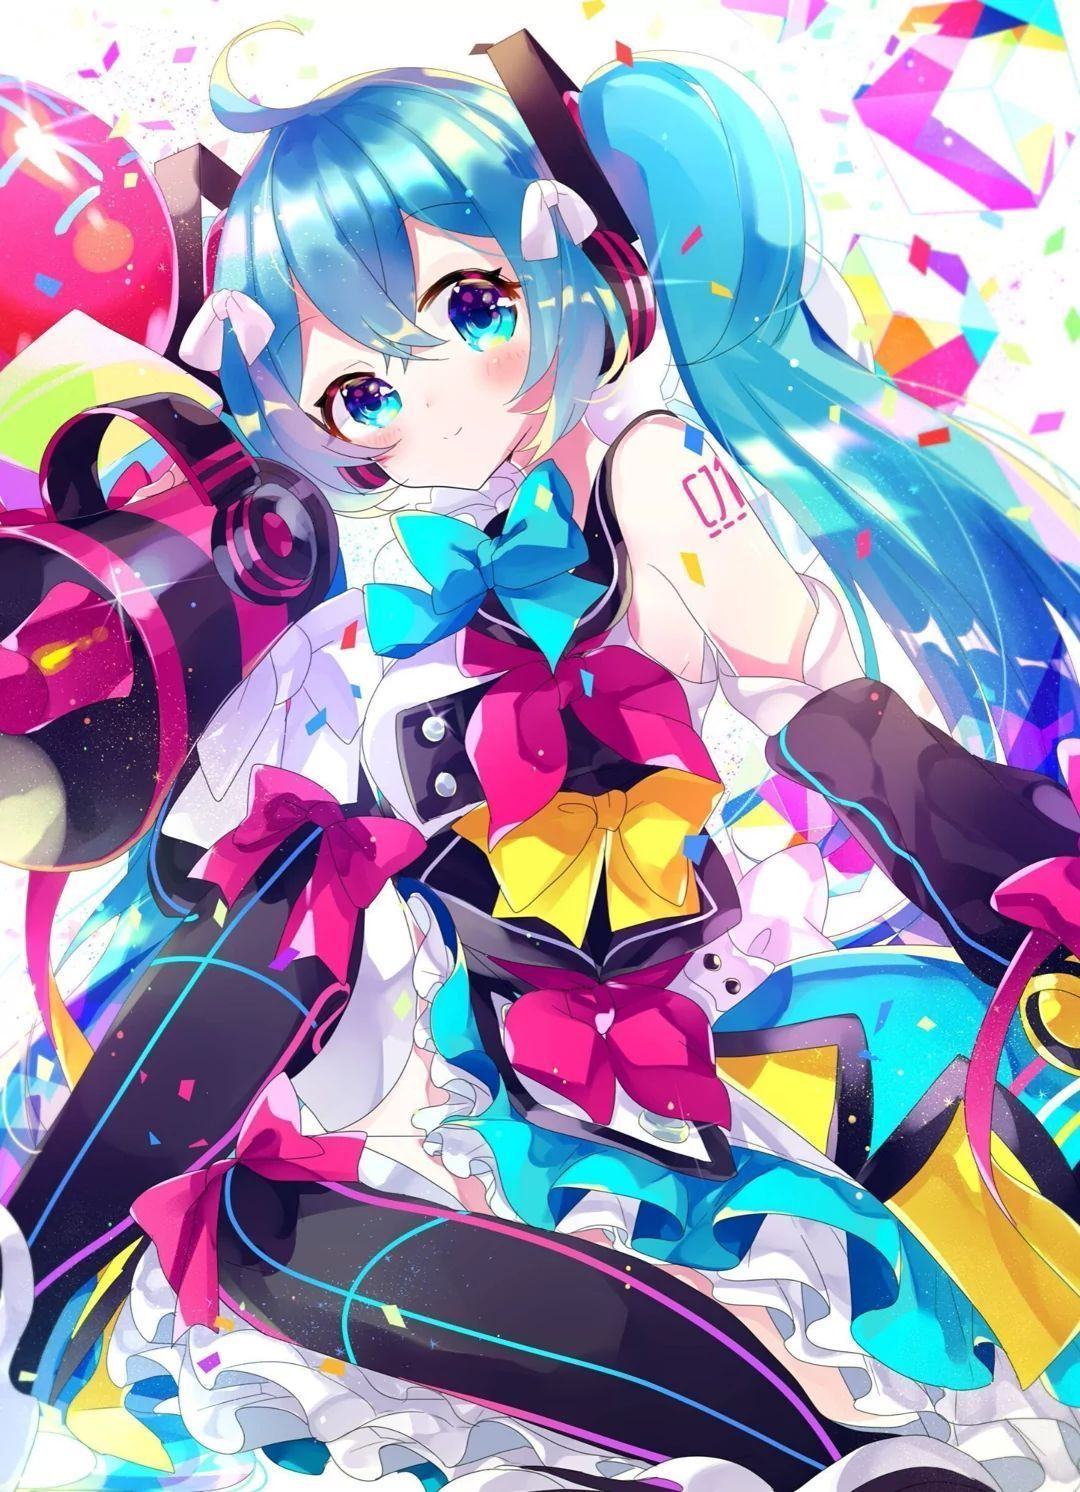 Customized Hatsune Miku はつね ミク Canvas Art Animation